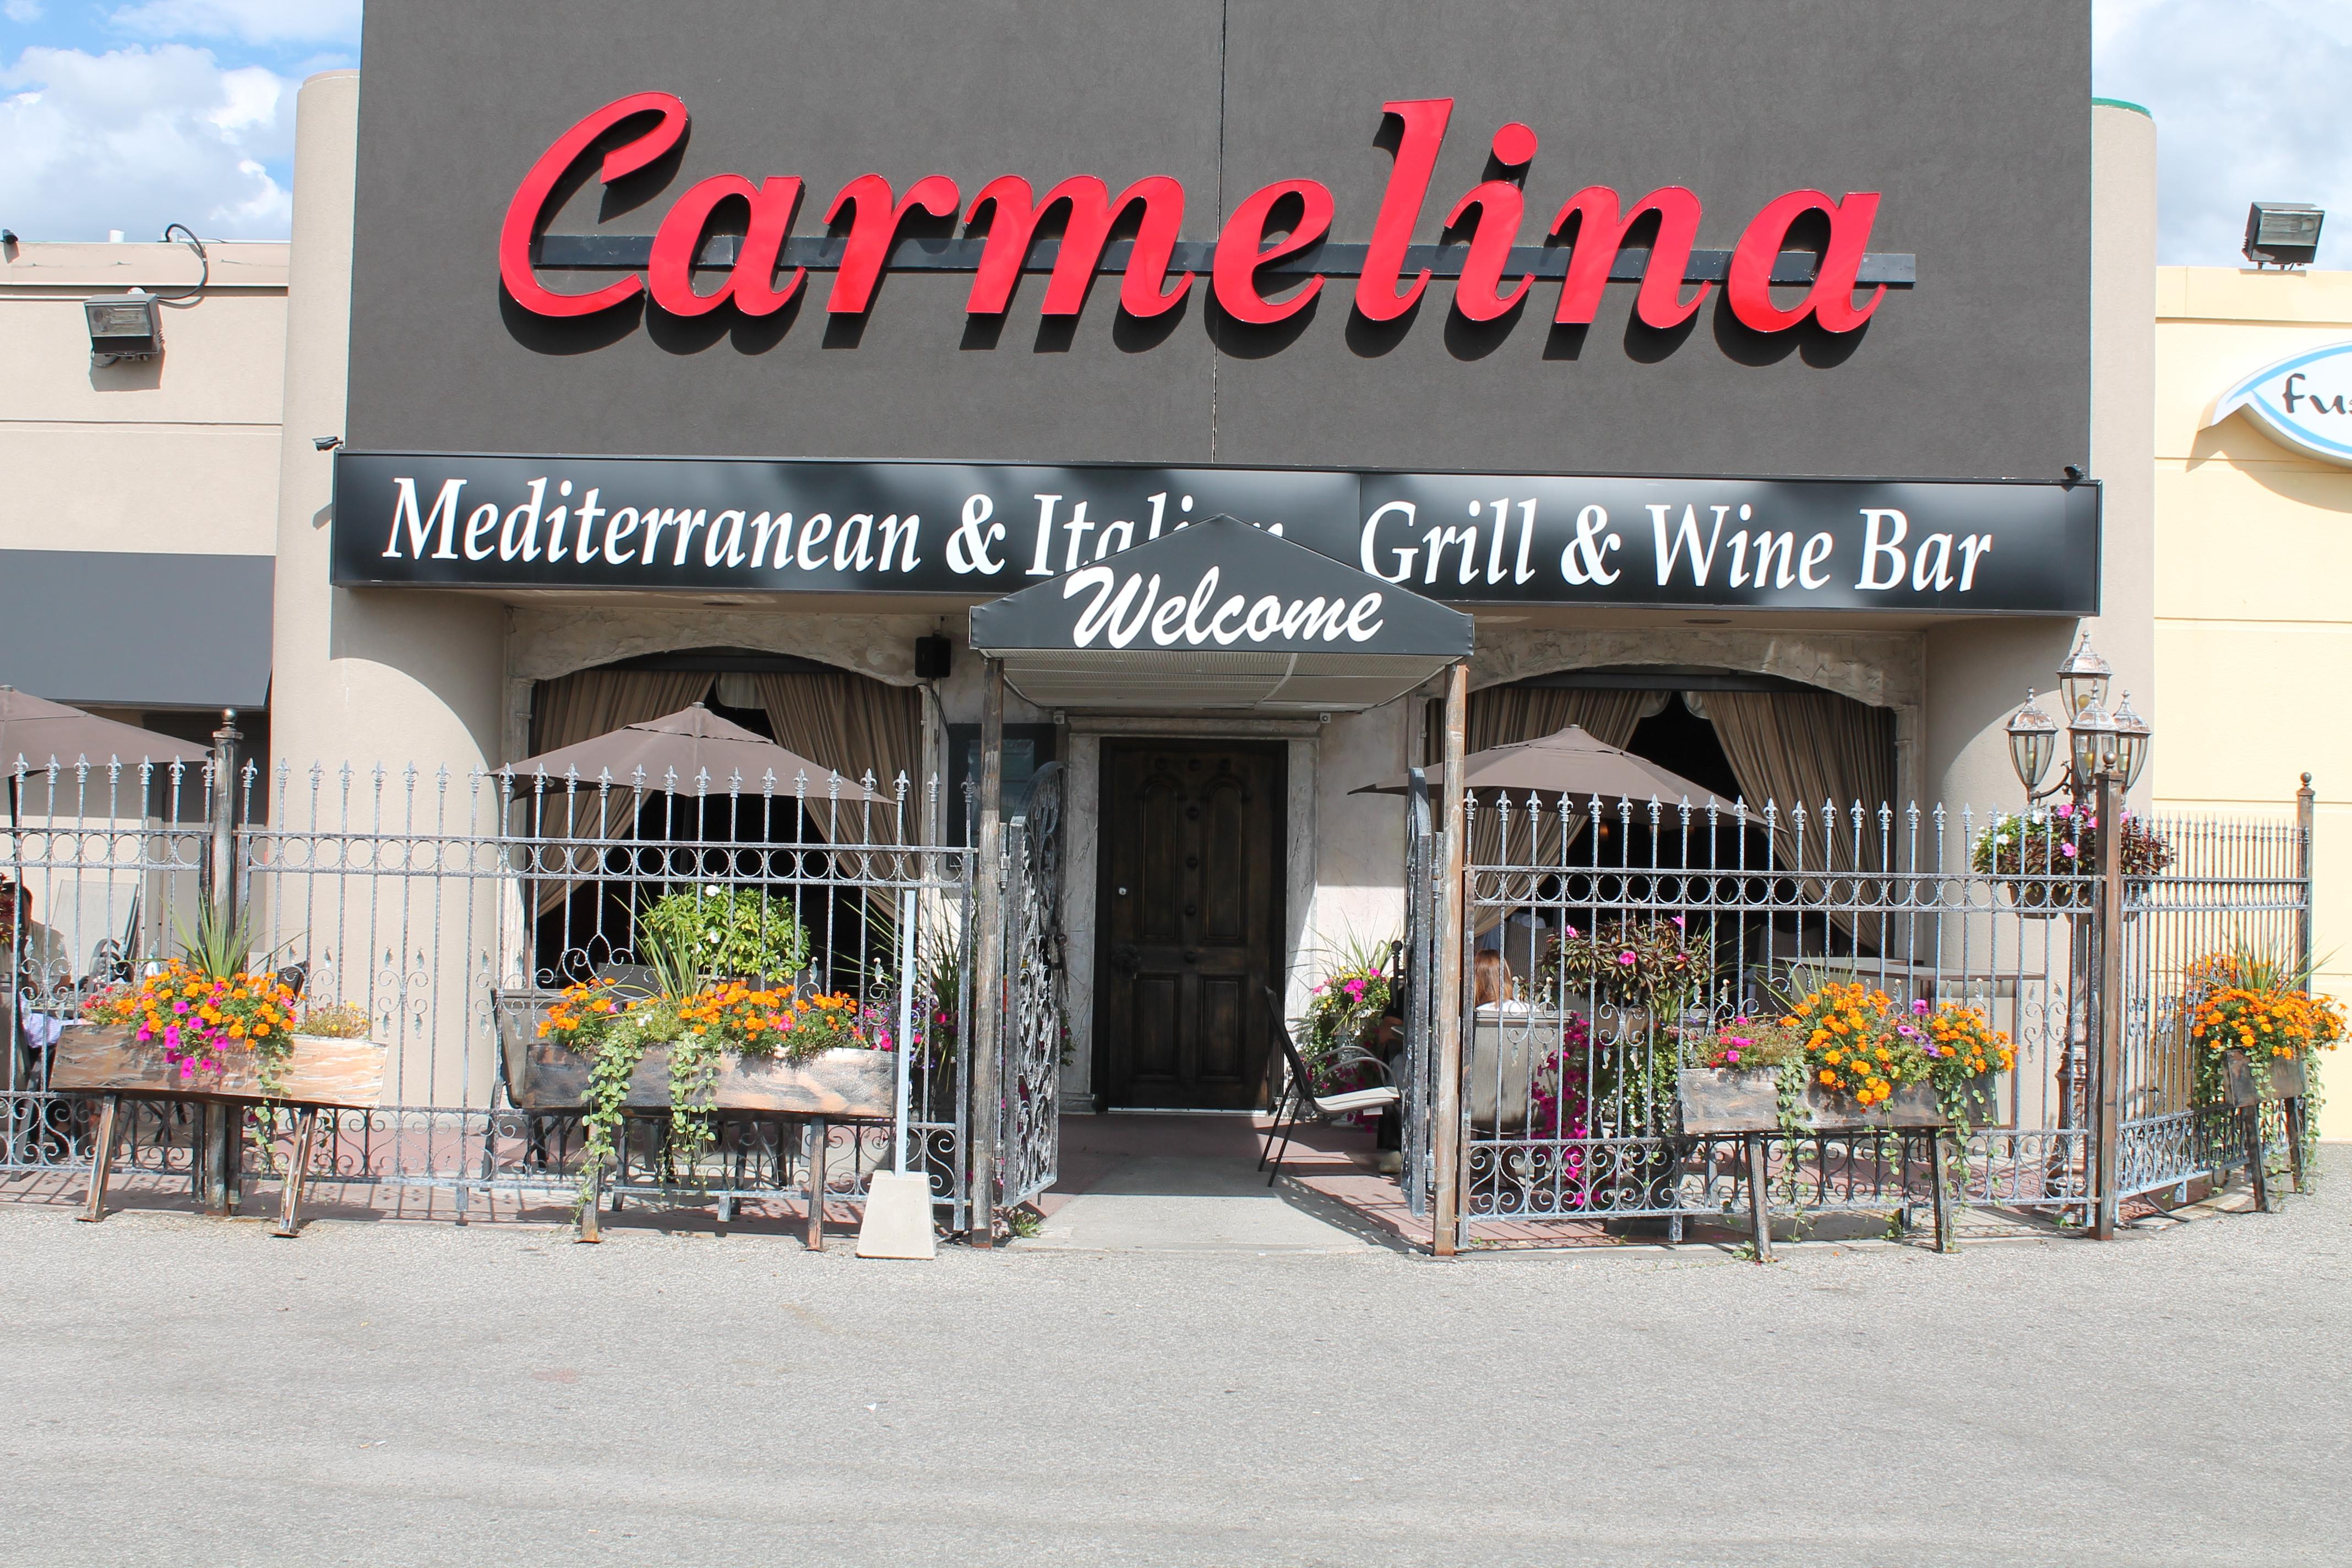 carmelina restaurant 7501 woodbine markham german mills